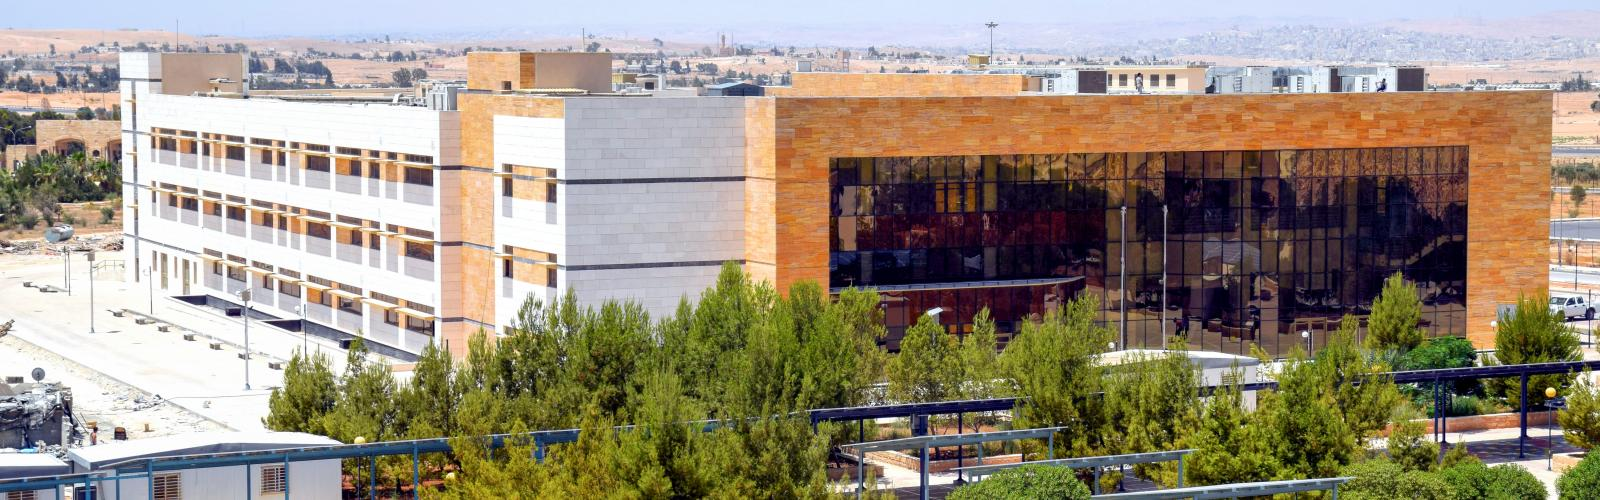 Desalination plant at the Hashemite University